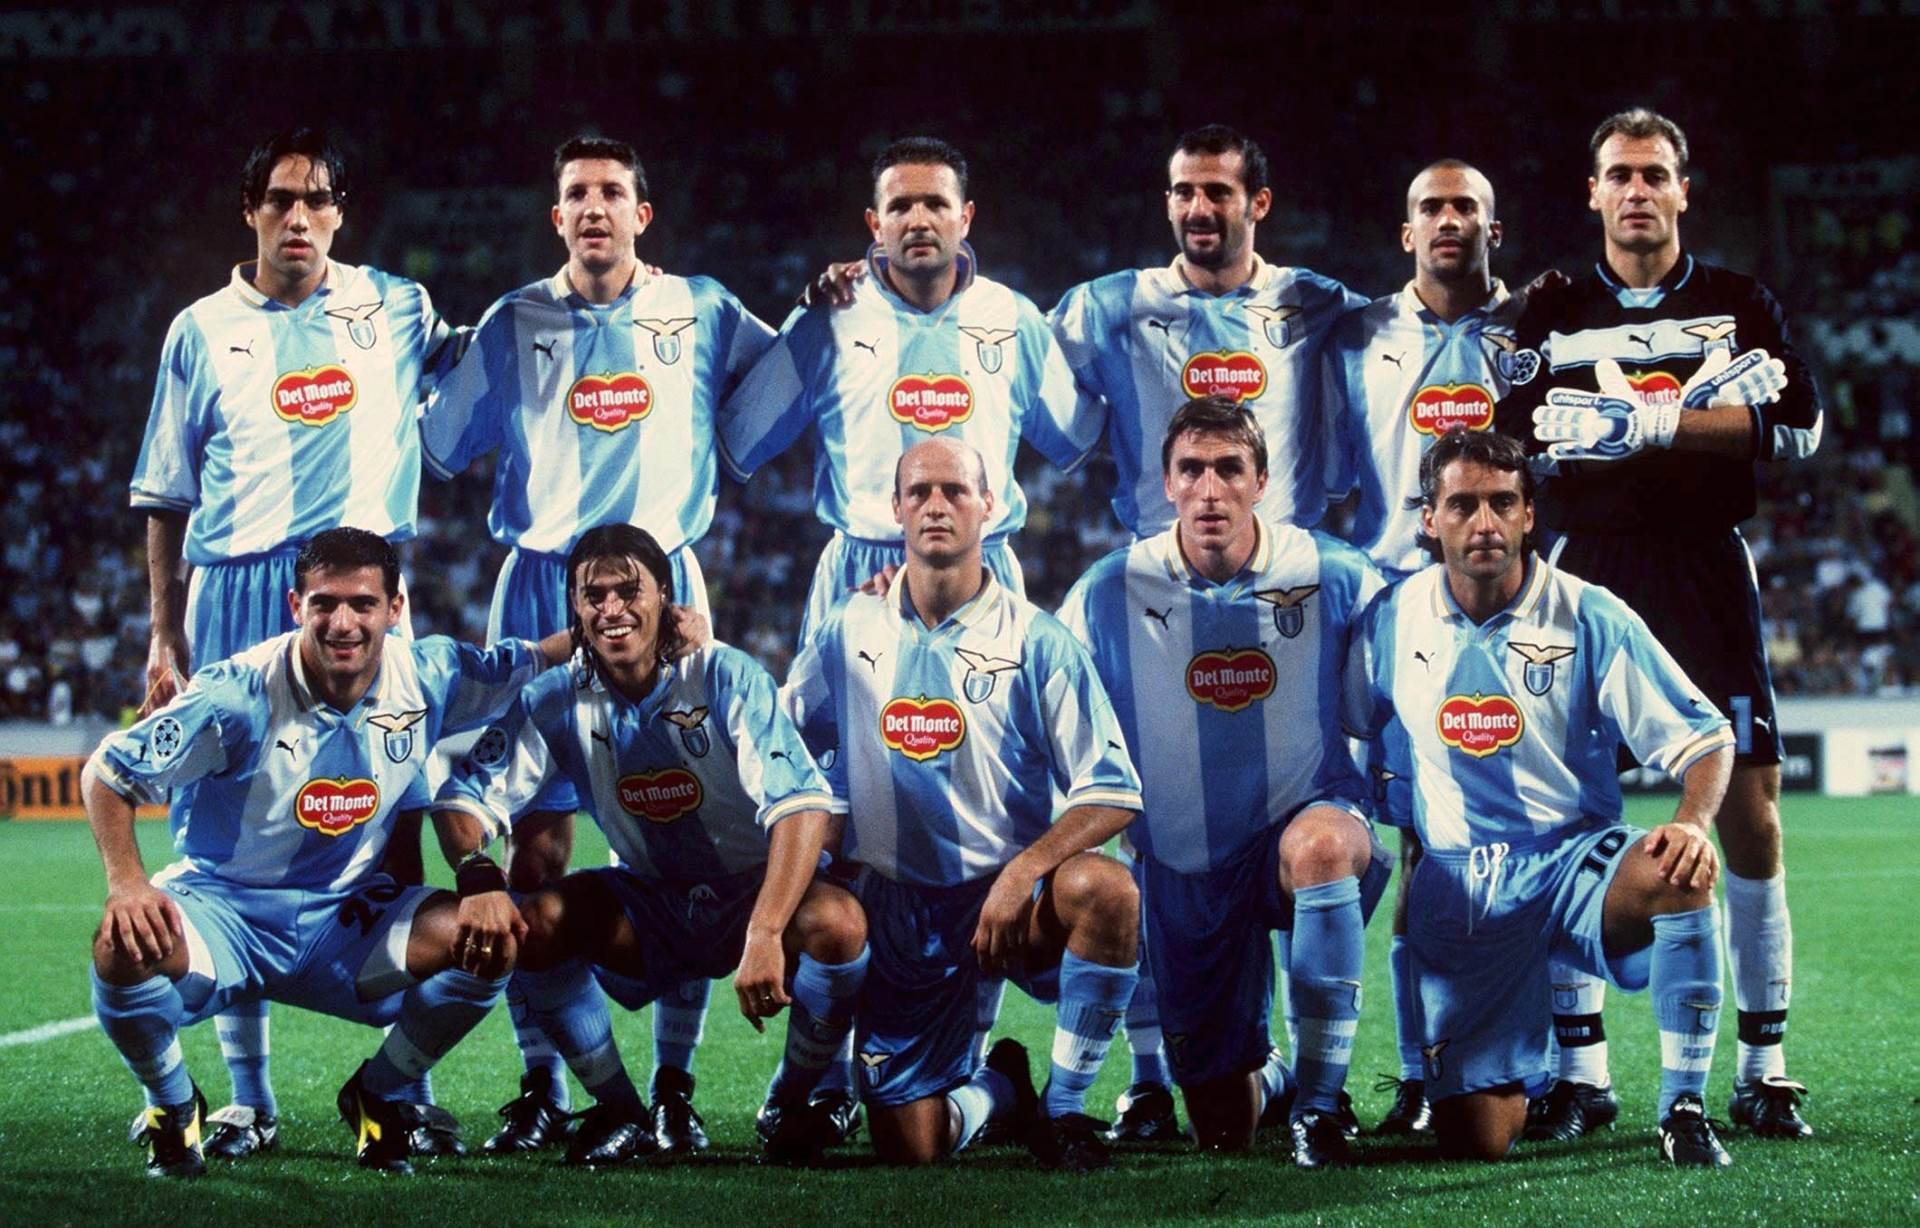 Lacio 1999/2000